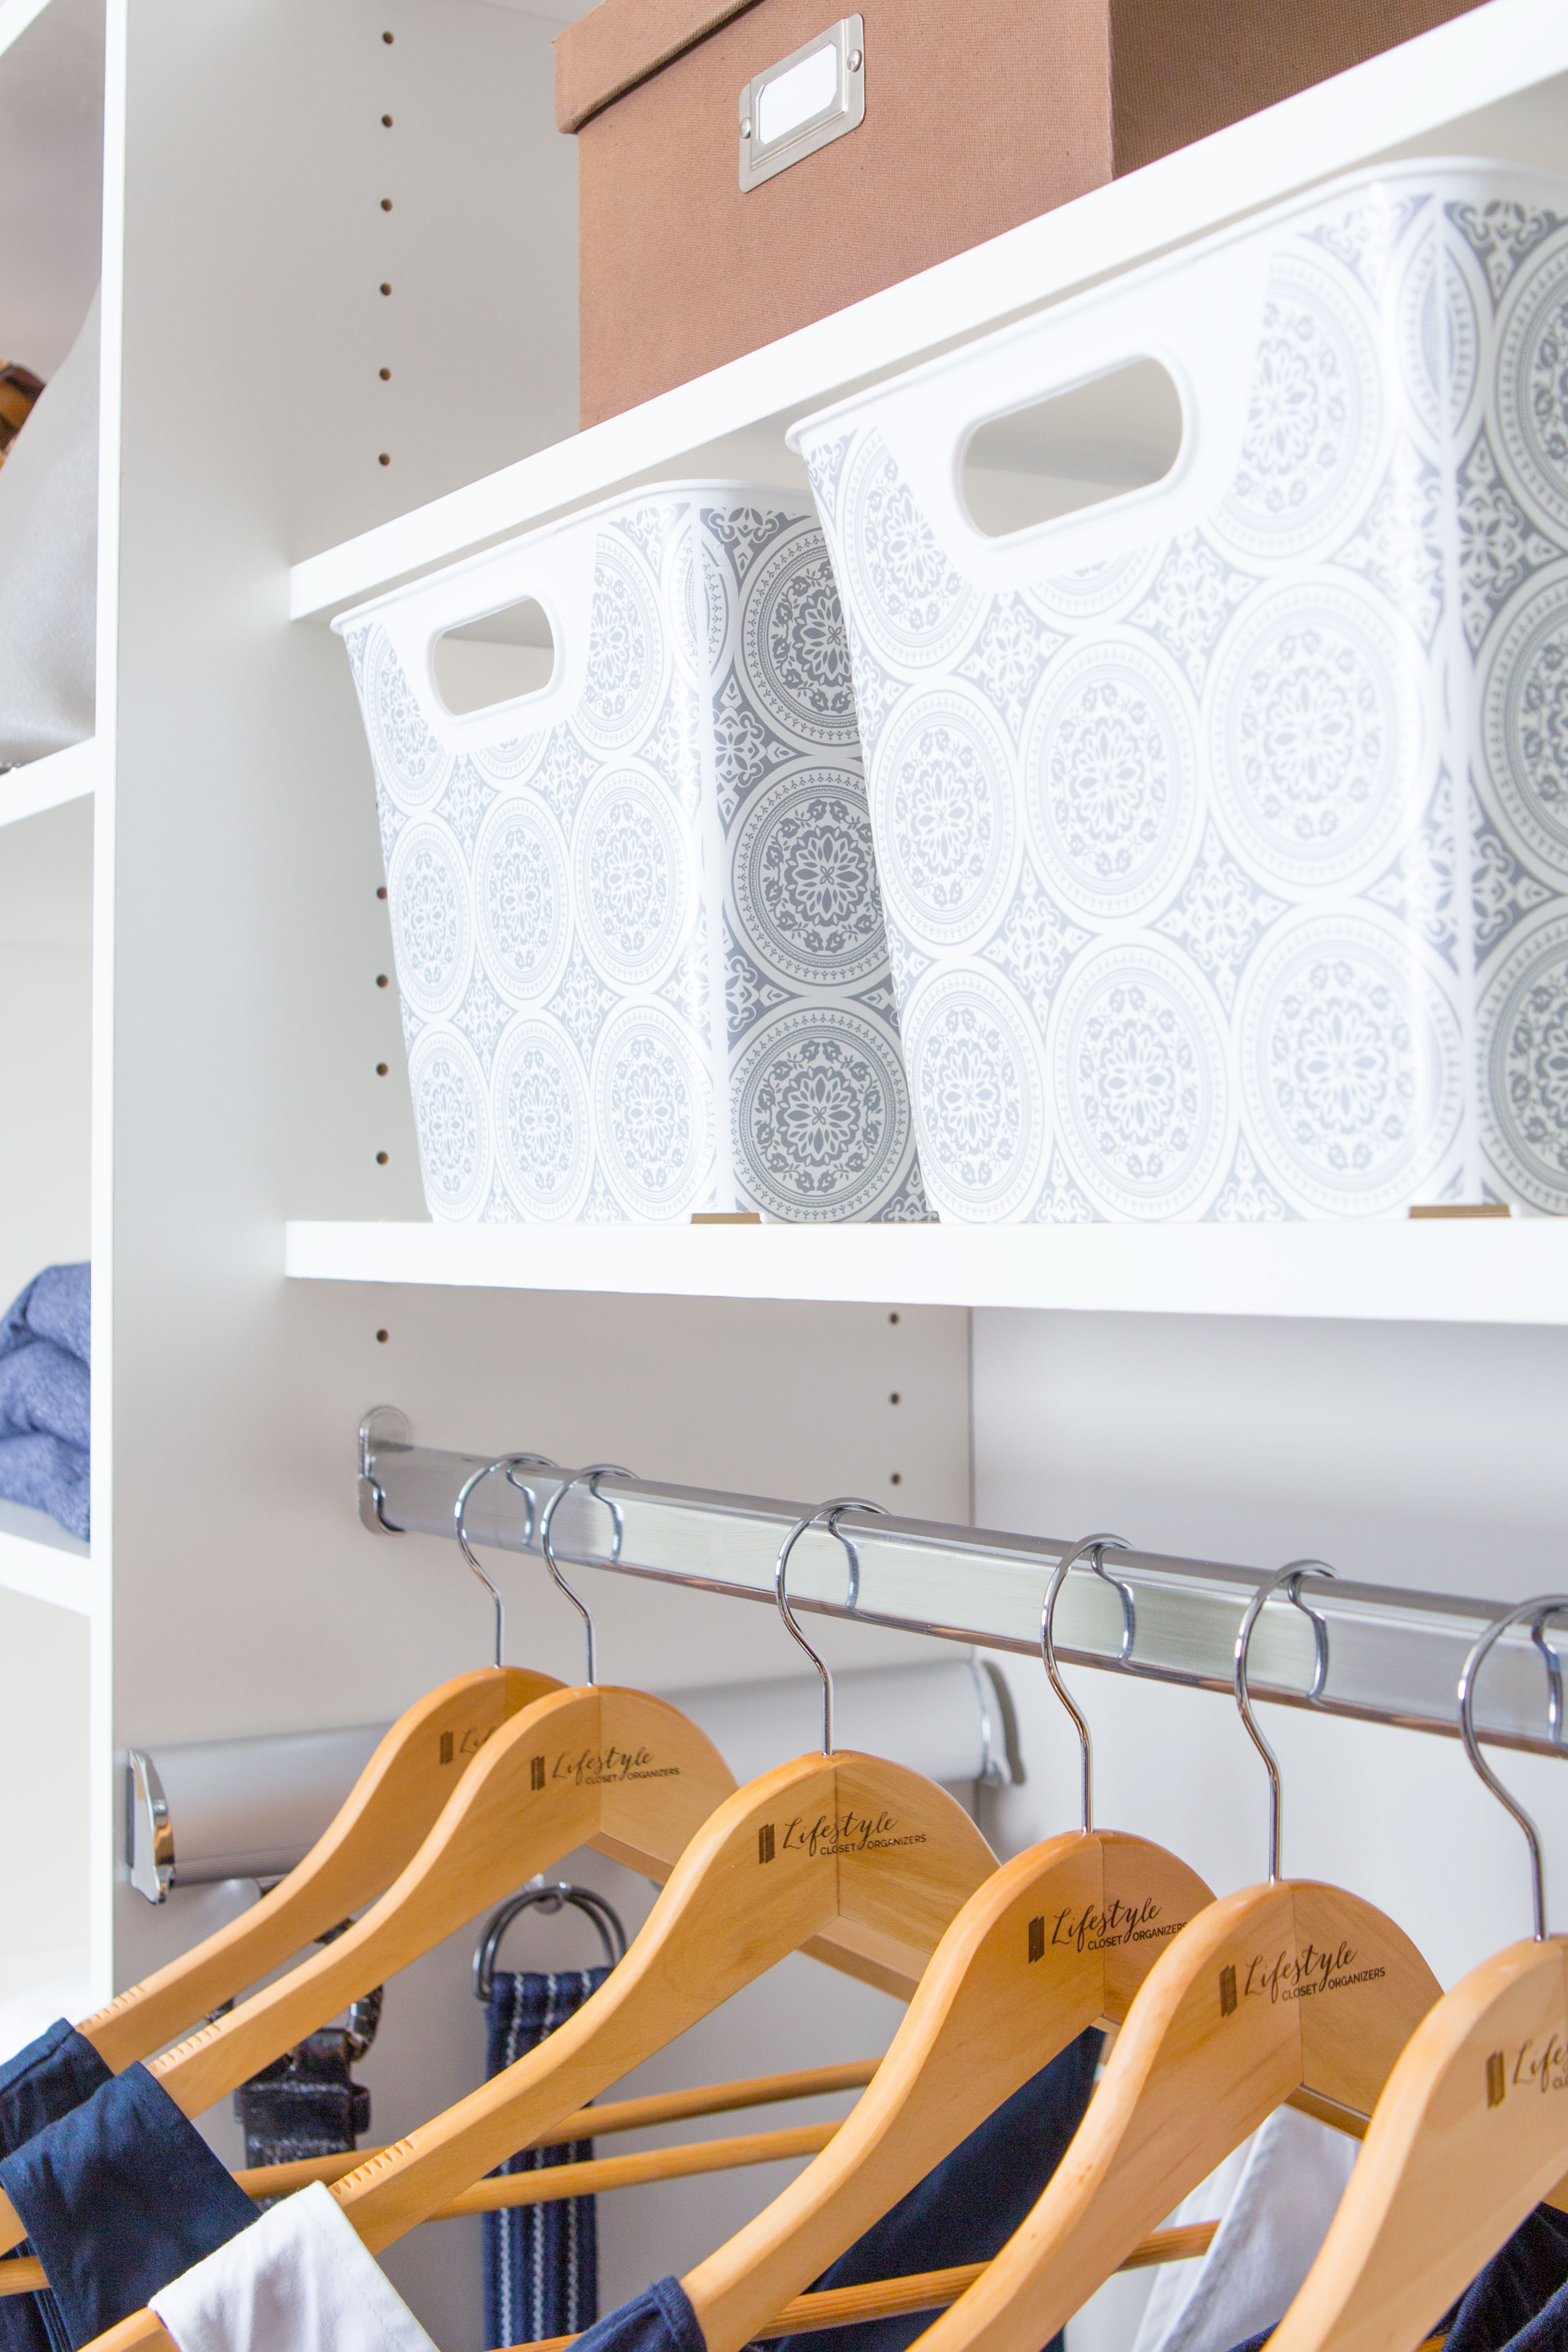 slab closets ideas teen classic covers solutions organization closet kids doors storage white suburban